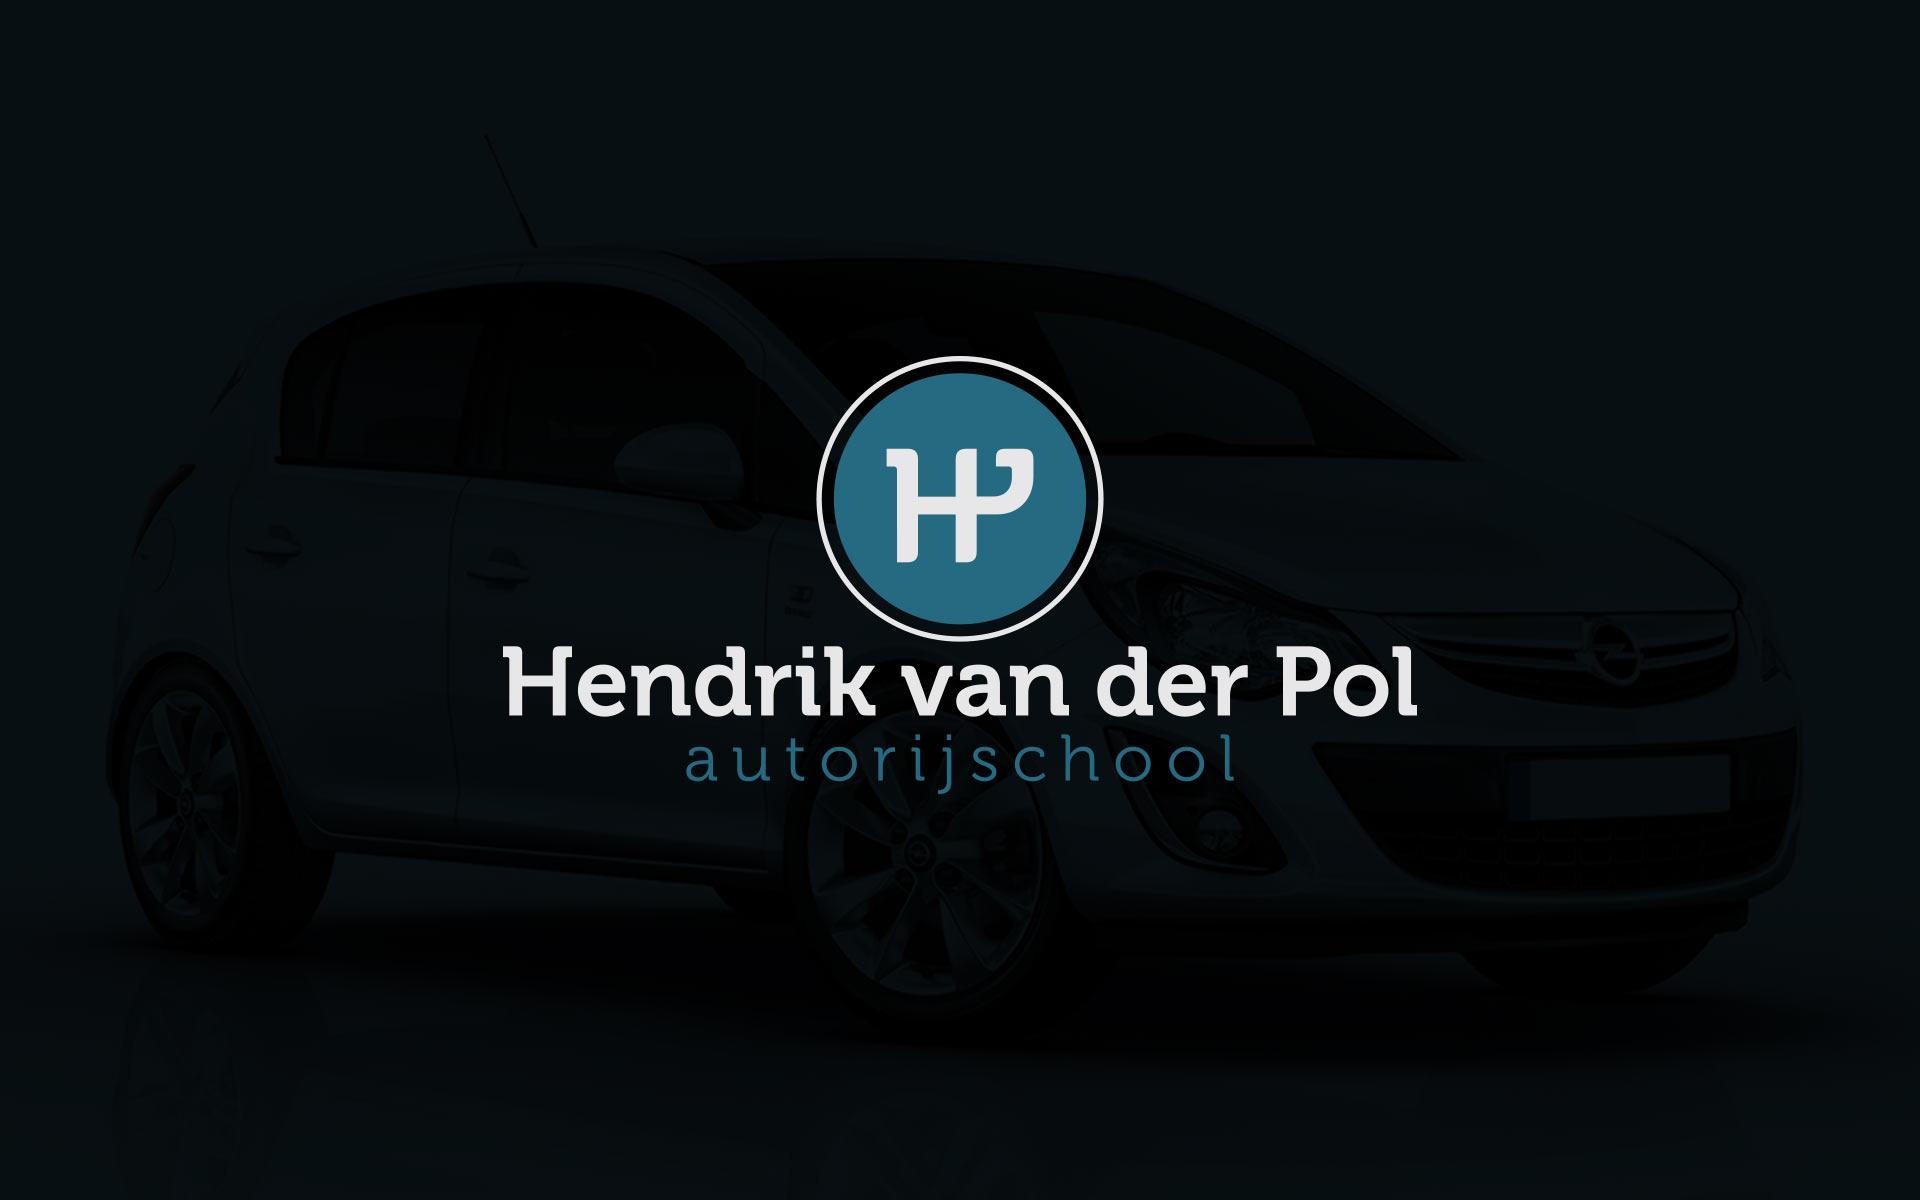 HVP_Header